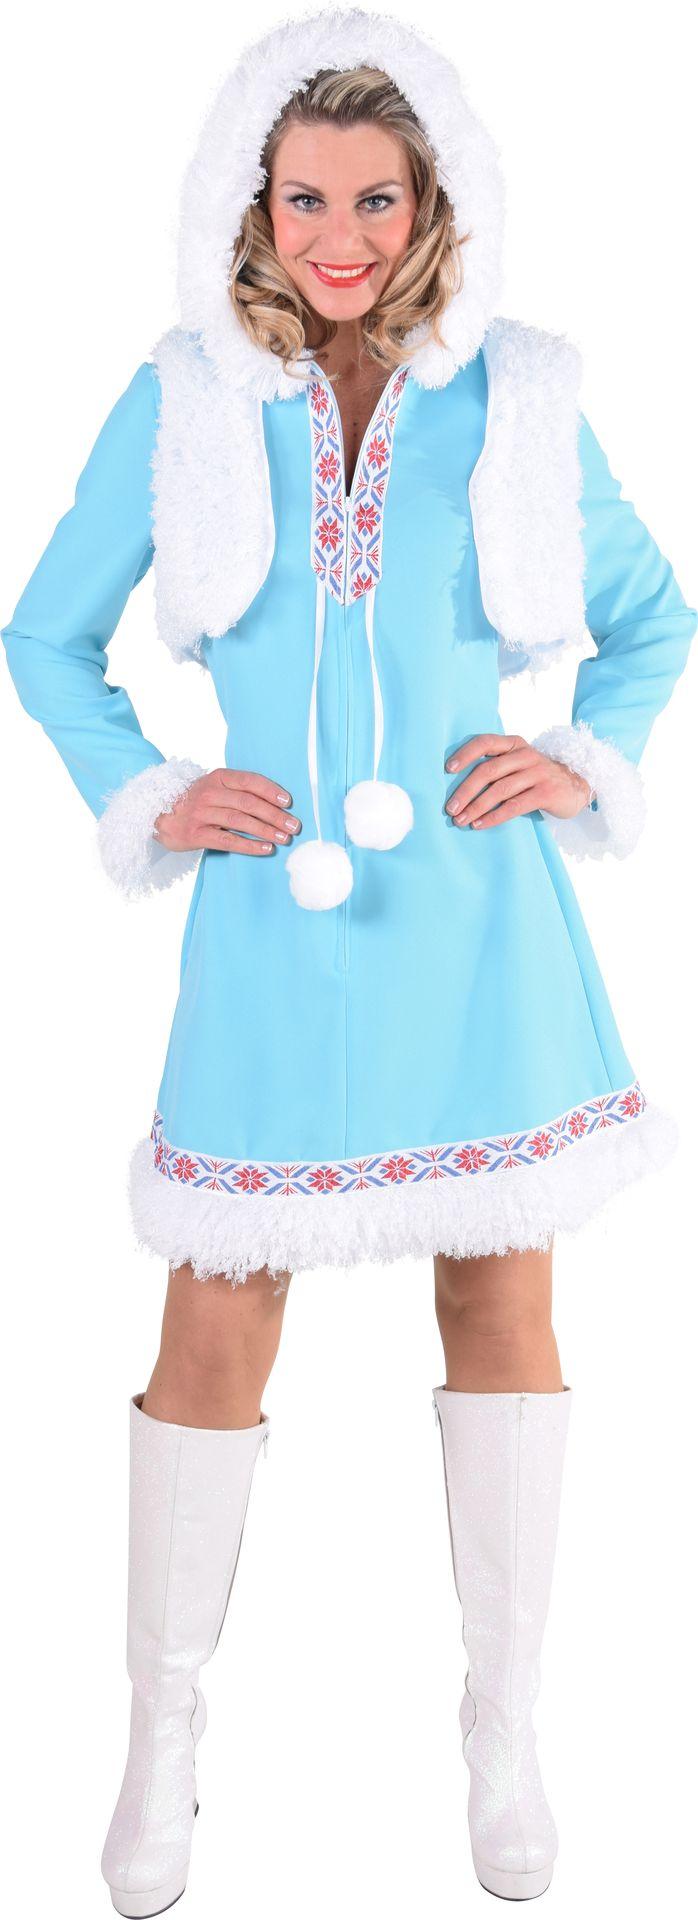 Blauwe winter jurk vrouwen